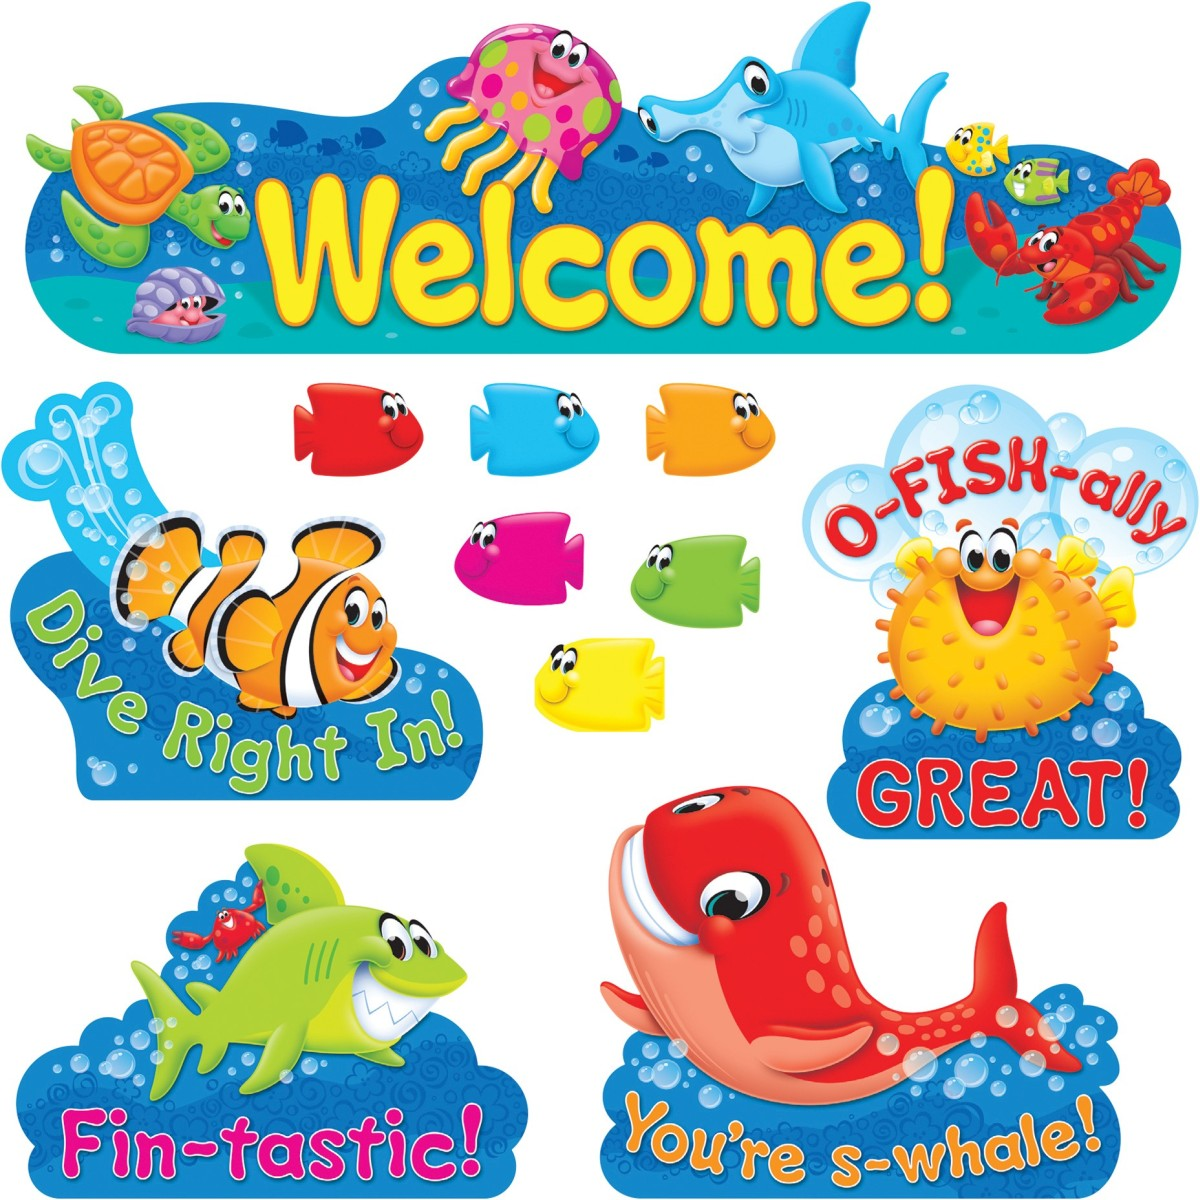 800 Sea Buddies School Teacher Reward Fish Stickers Ideal For Incentive Charts